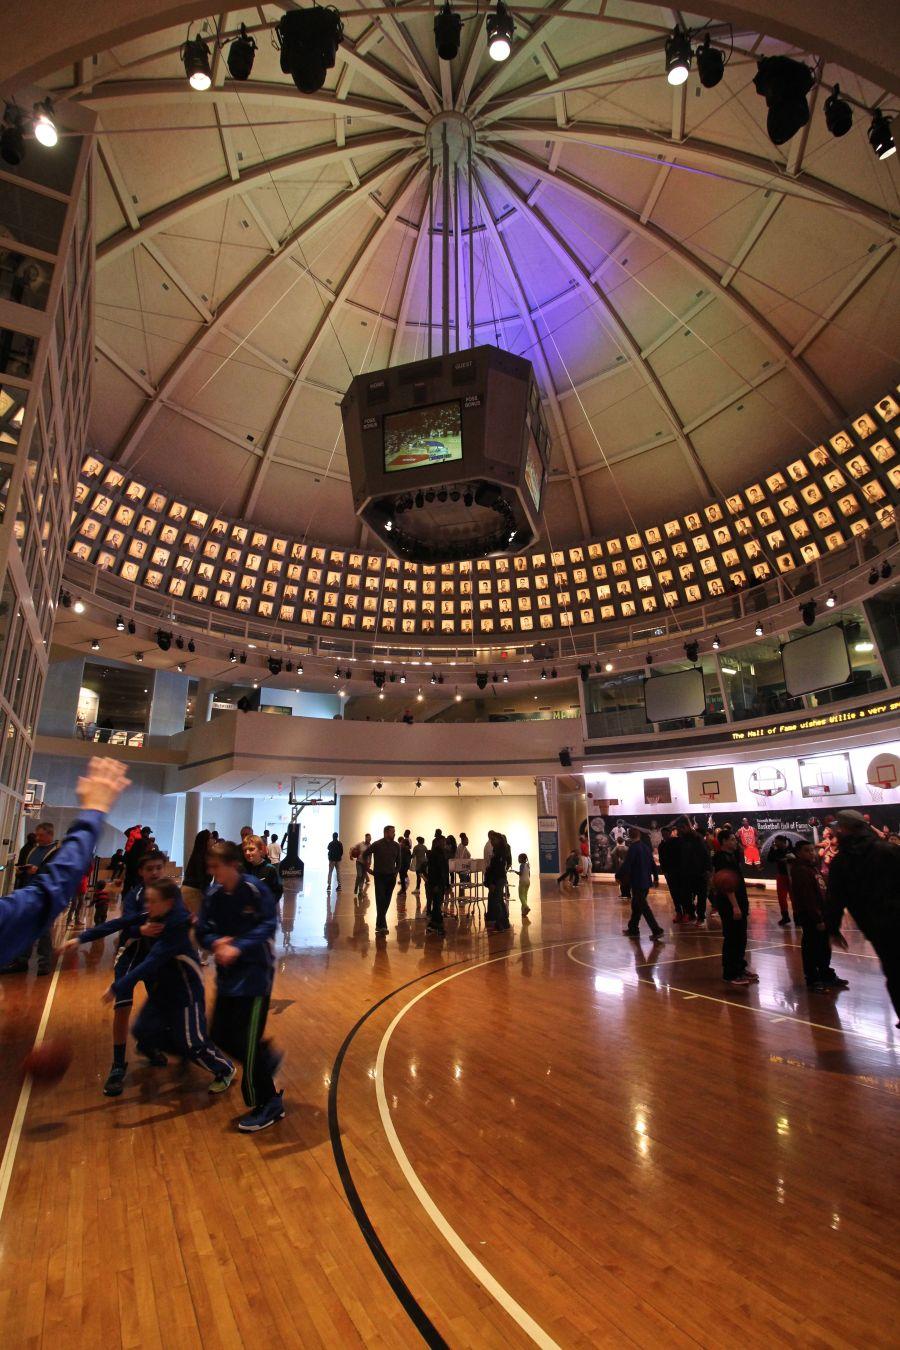 Springfield Naismith Memorial Basketball Hall of Fame basketball court floor